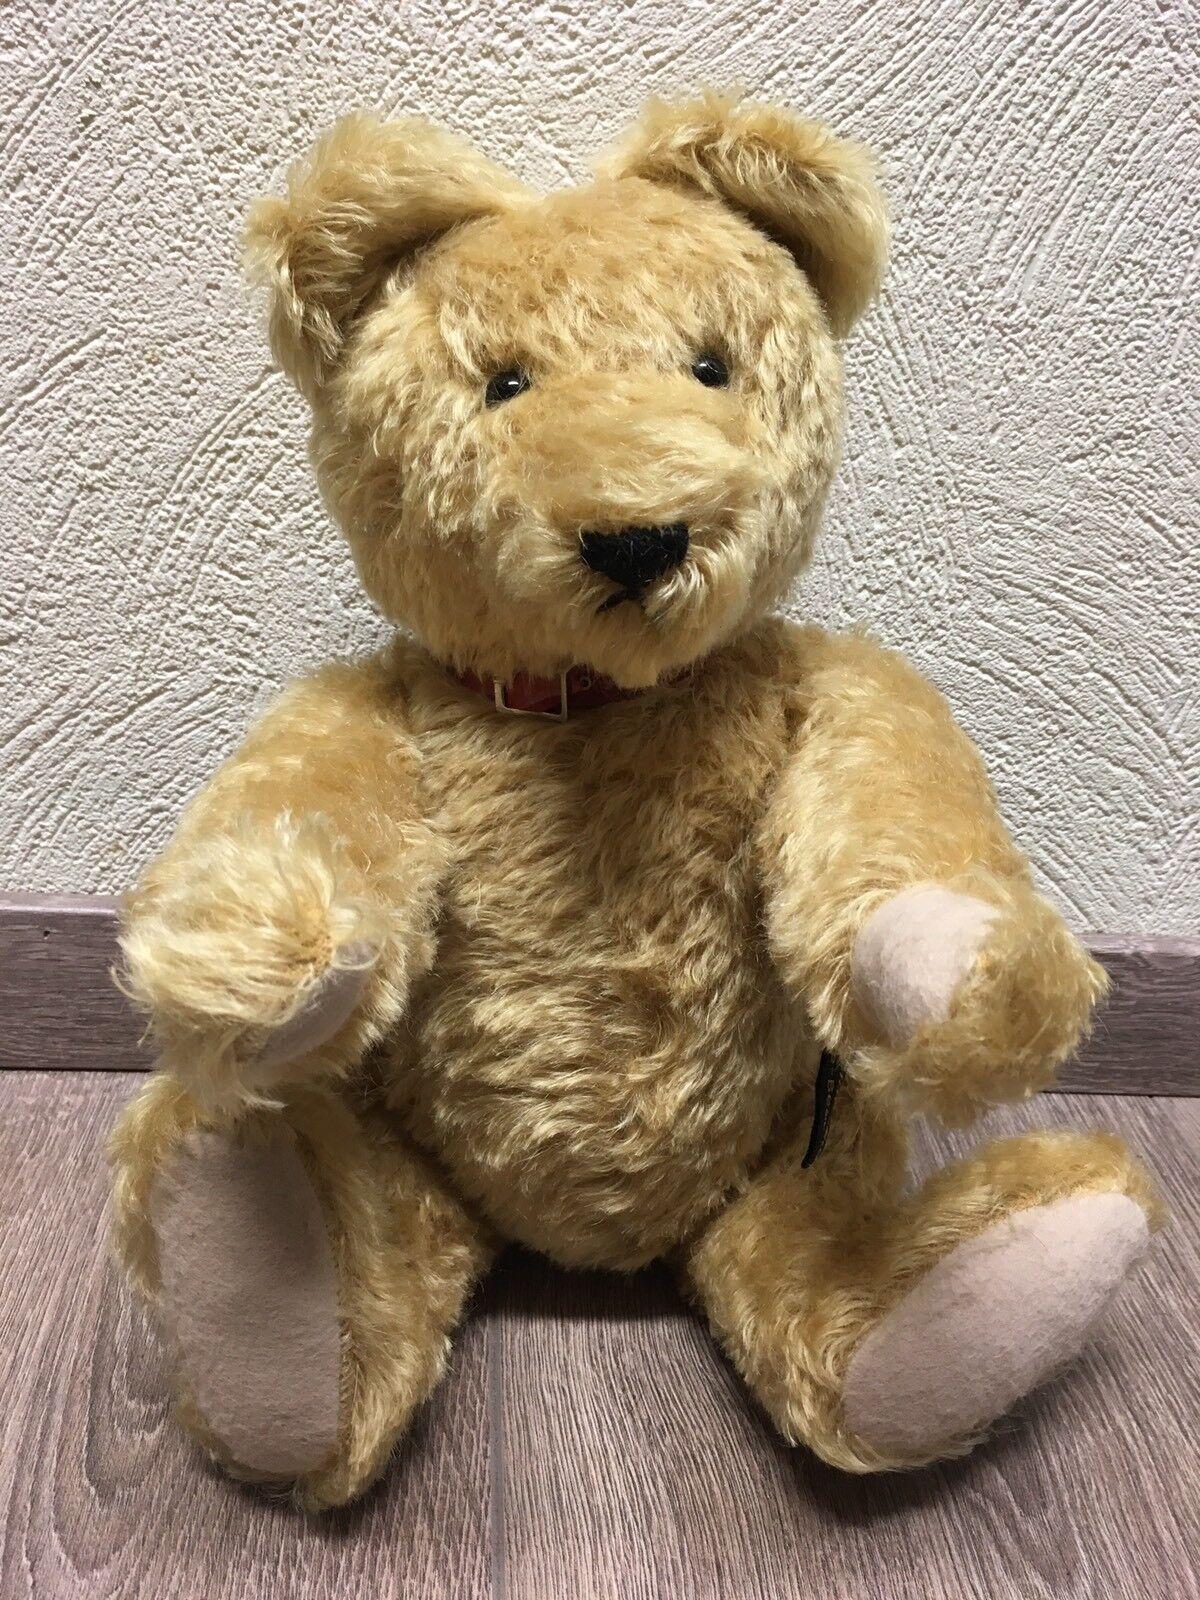 Europe-Bear Teddy Bär Johanna Haida 38 cm Bear mit Buckel Und Stimme